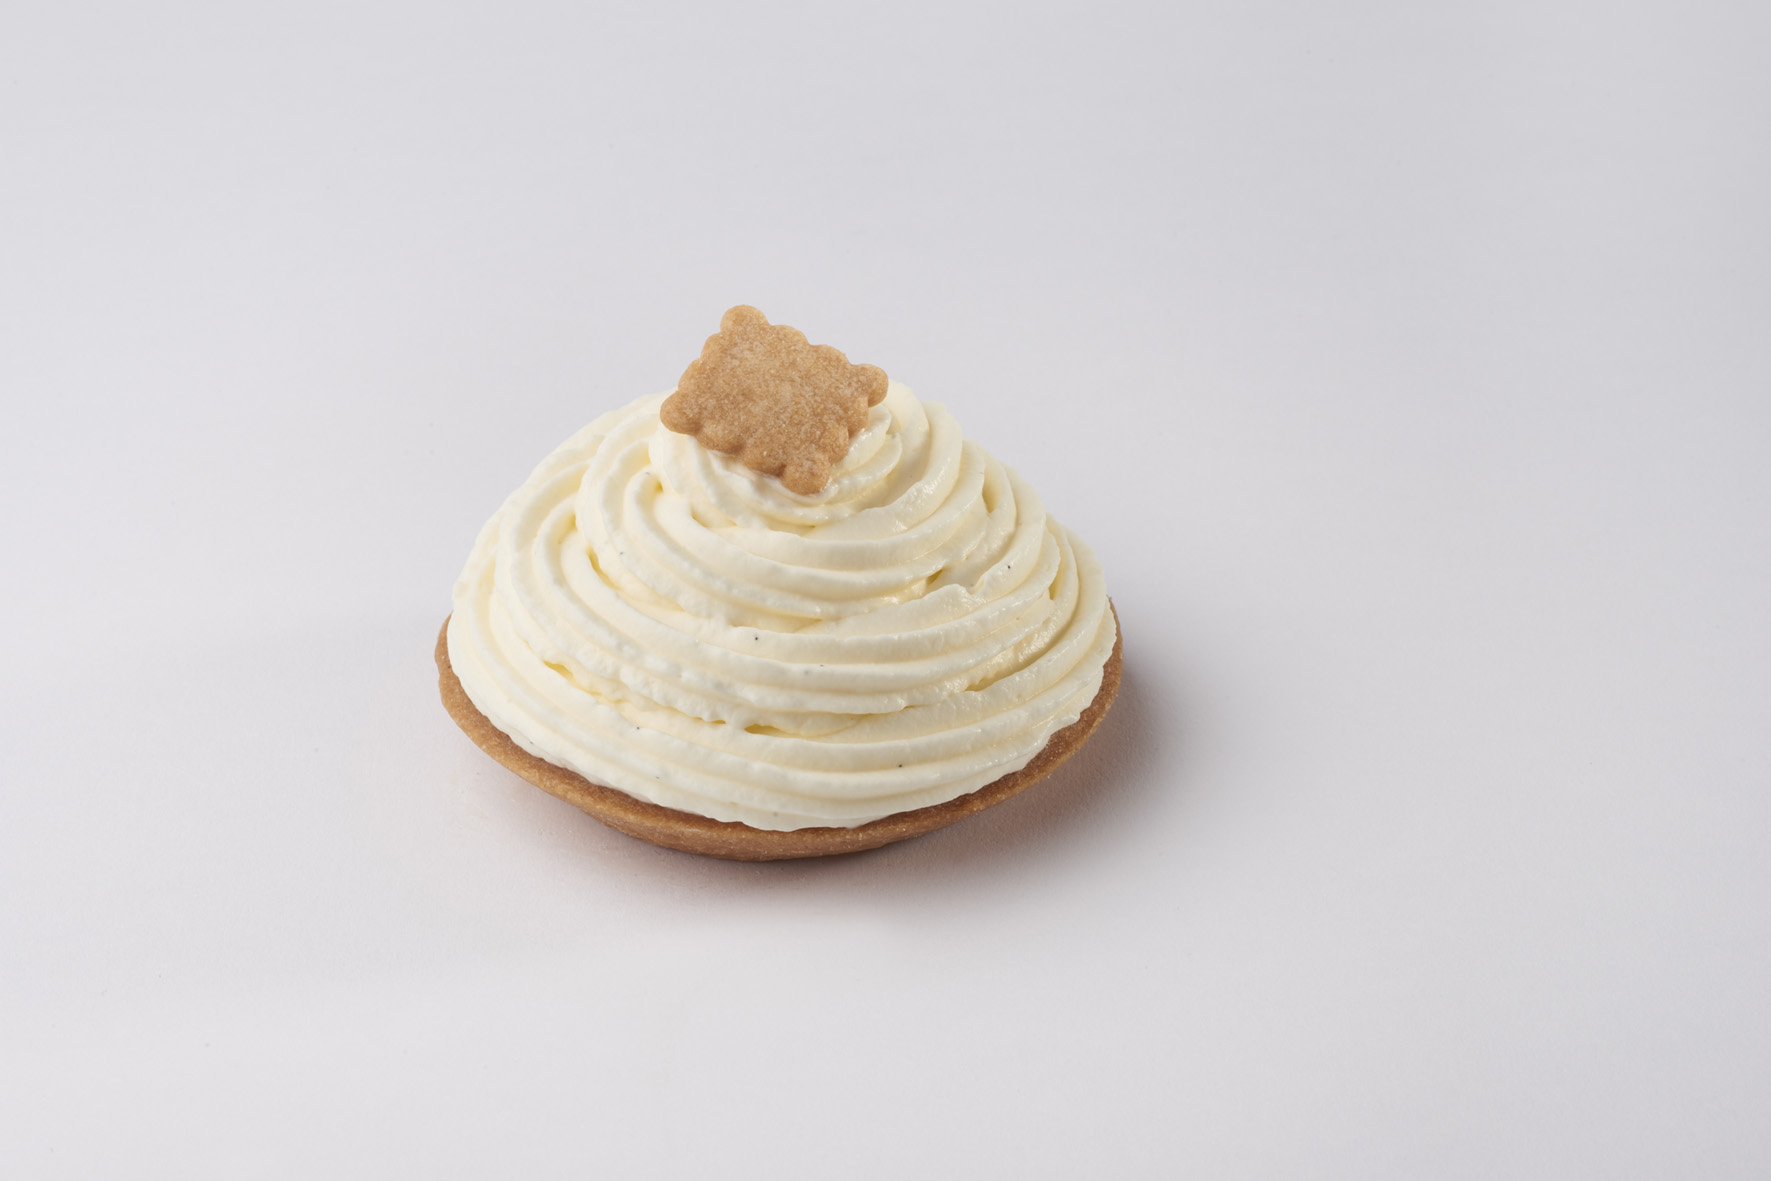 Cream cake from Liberté Boulangerie, Paris